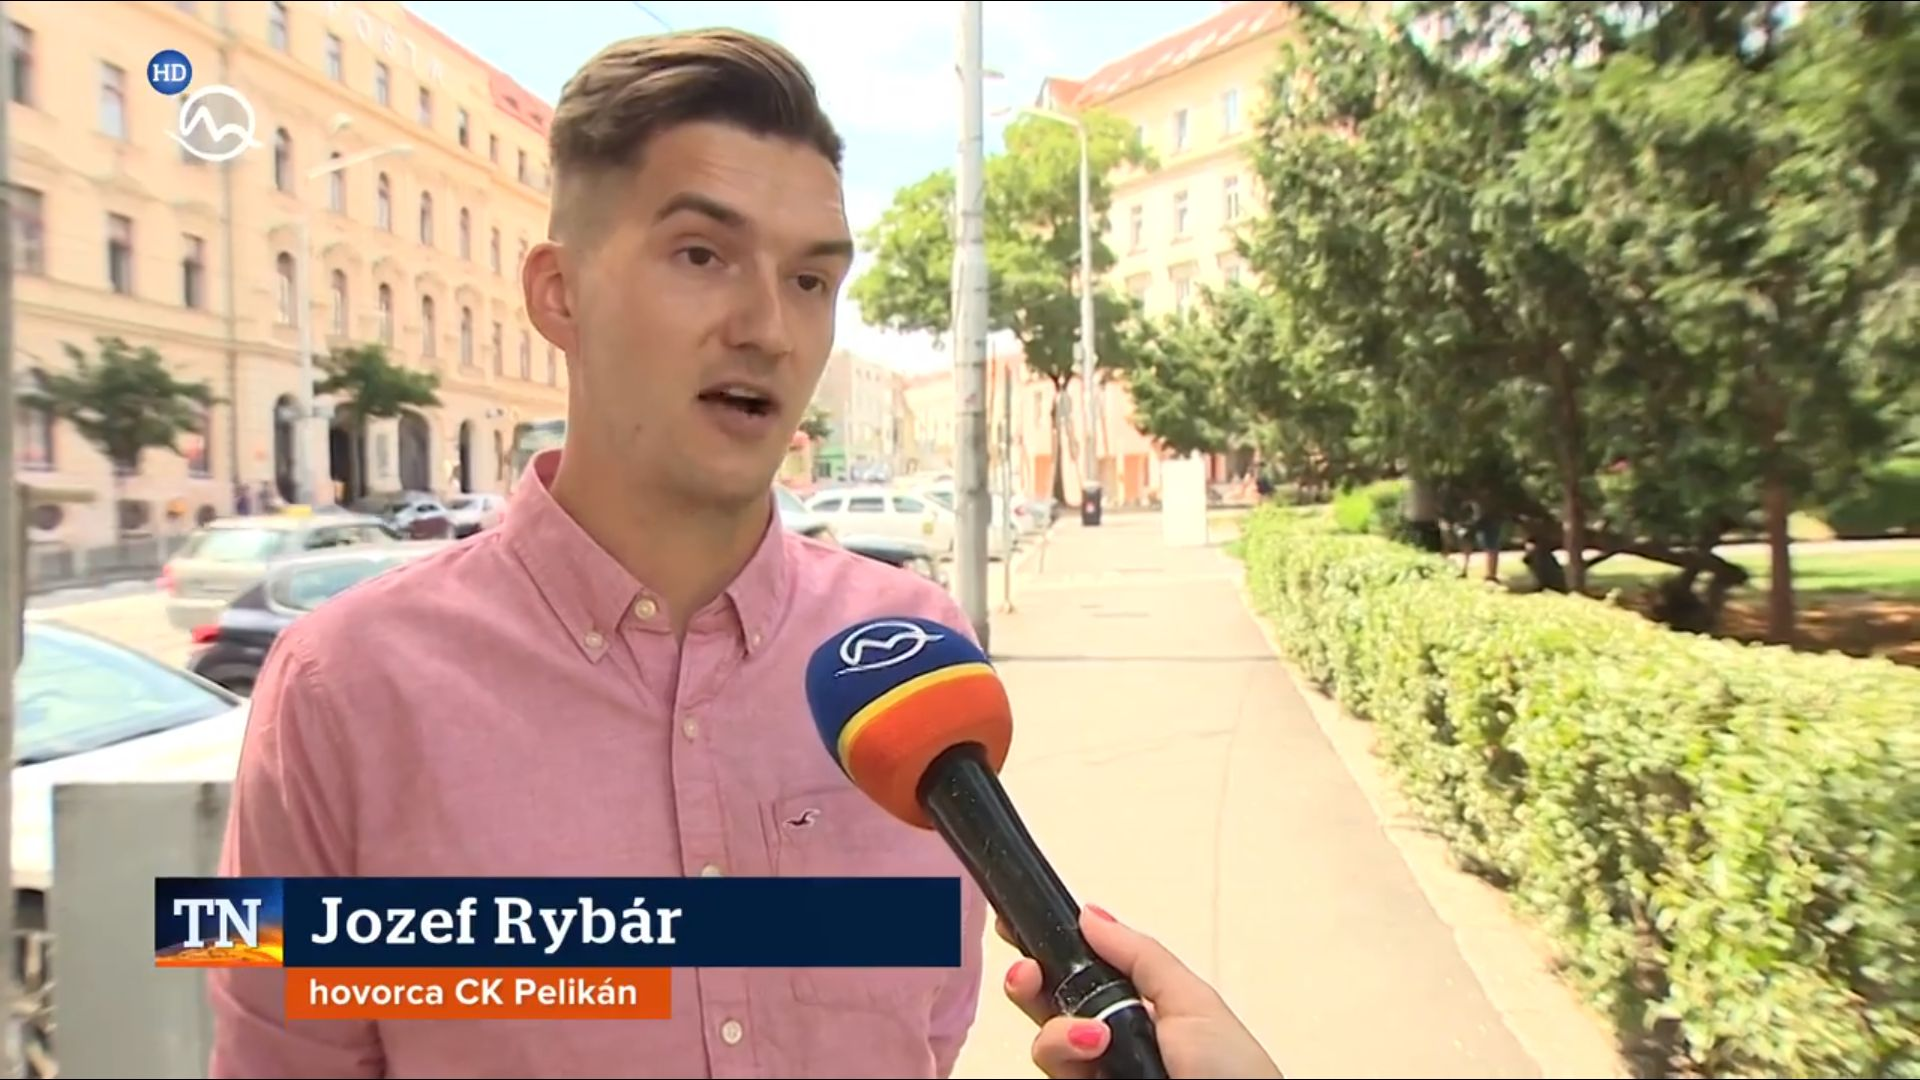 jozef rybar pr manager cestovna kancelaria pelikan televizne noviny markiza